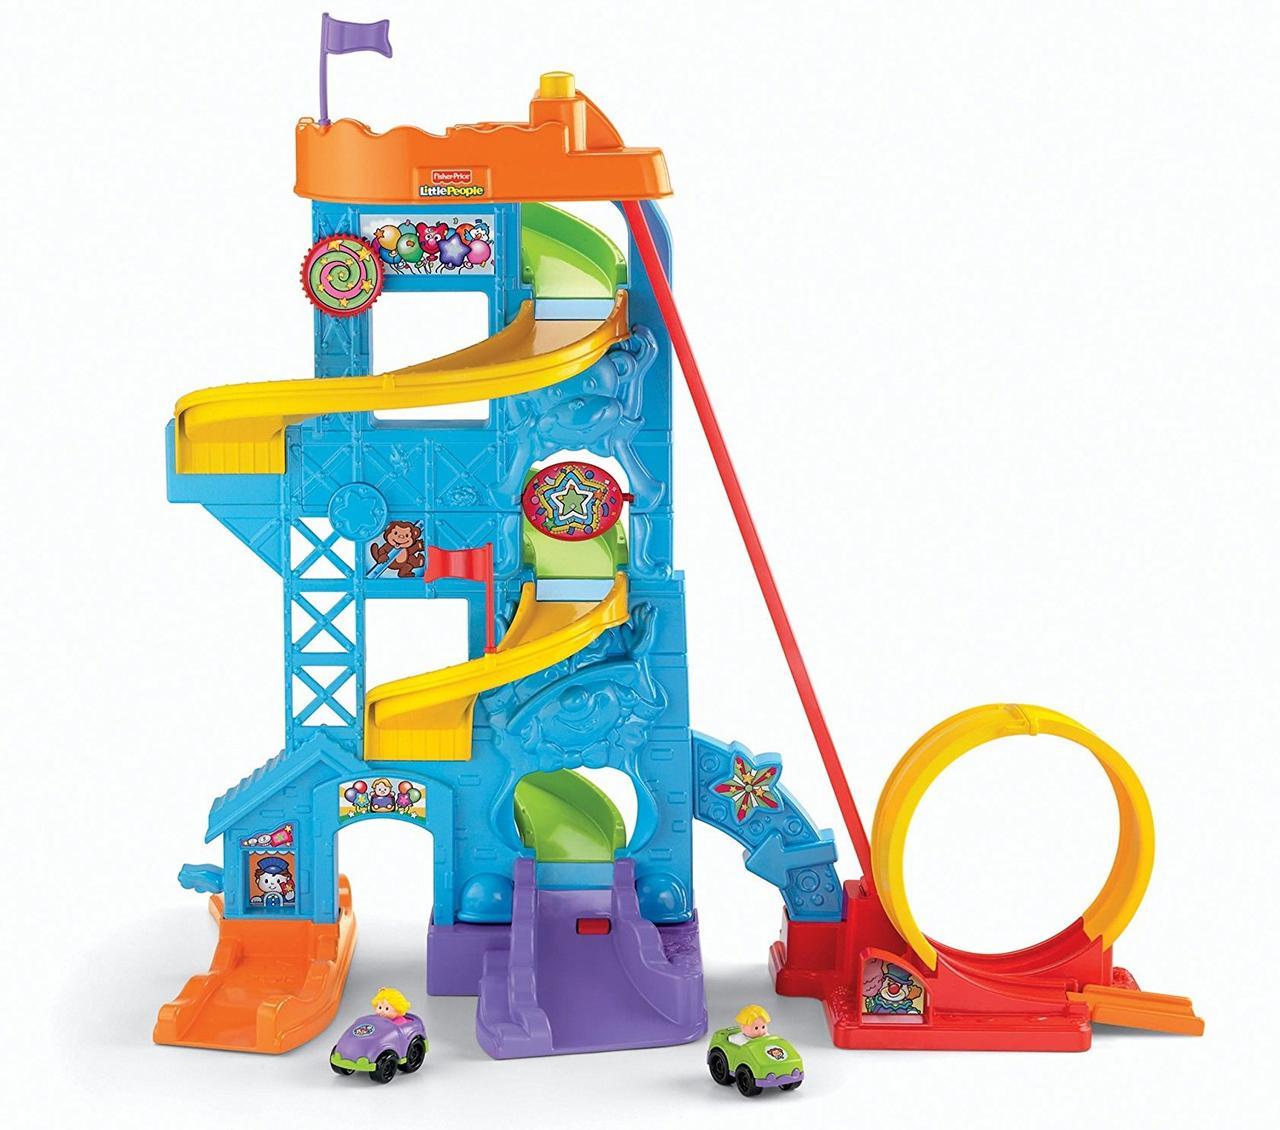 Fisher-Price парк развлечений Little People эко упаковка Loops n Swoops Amusement Park